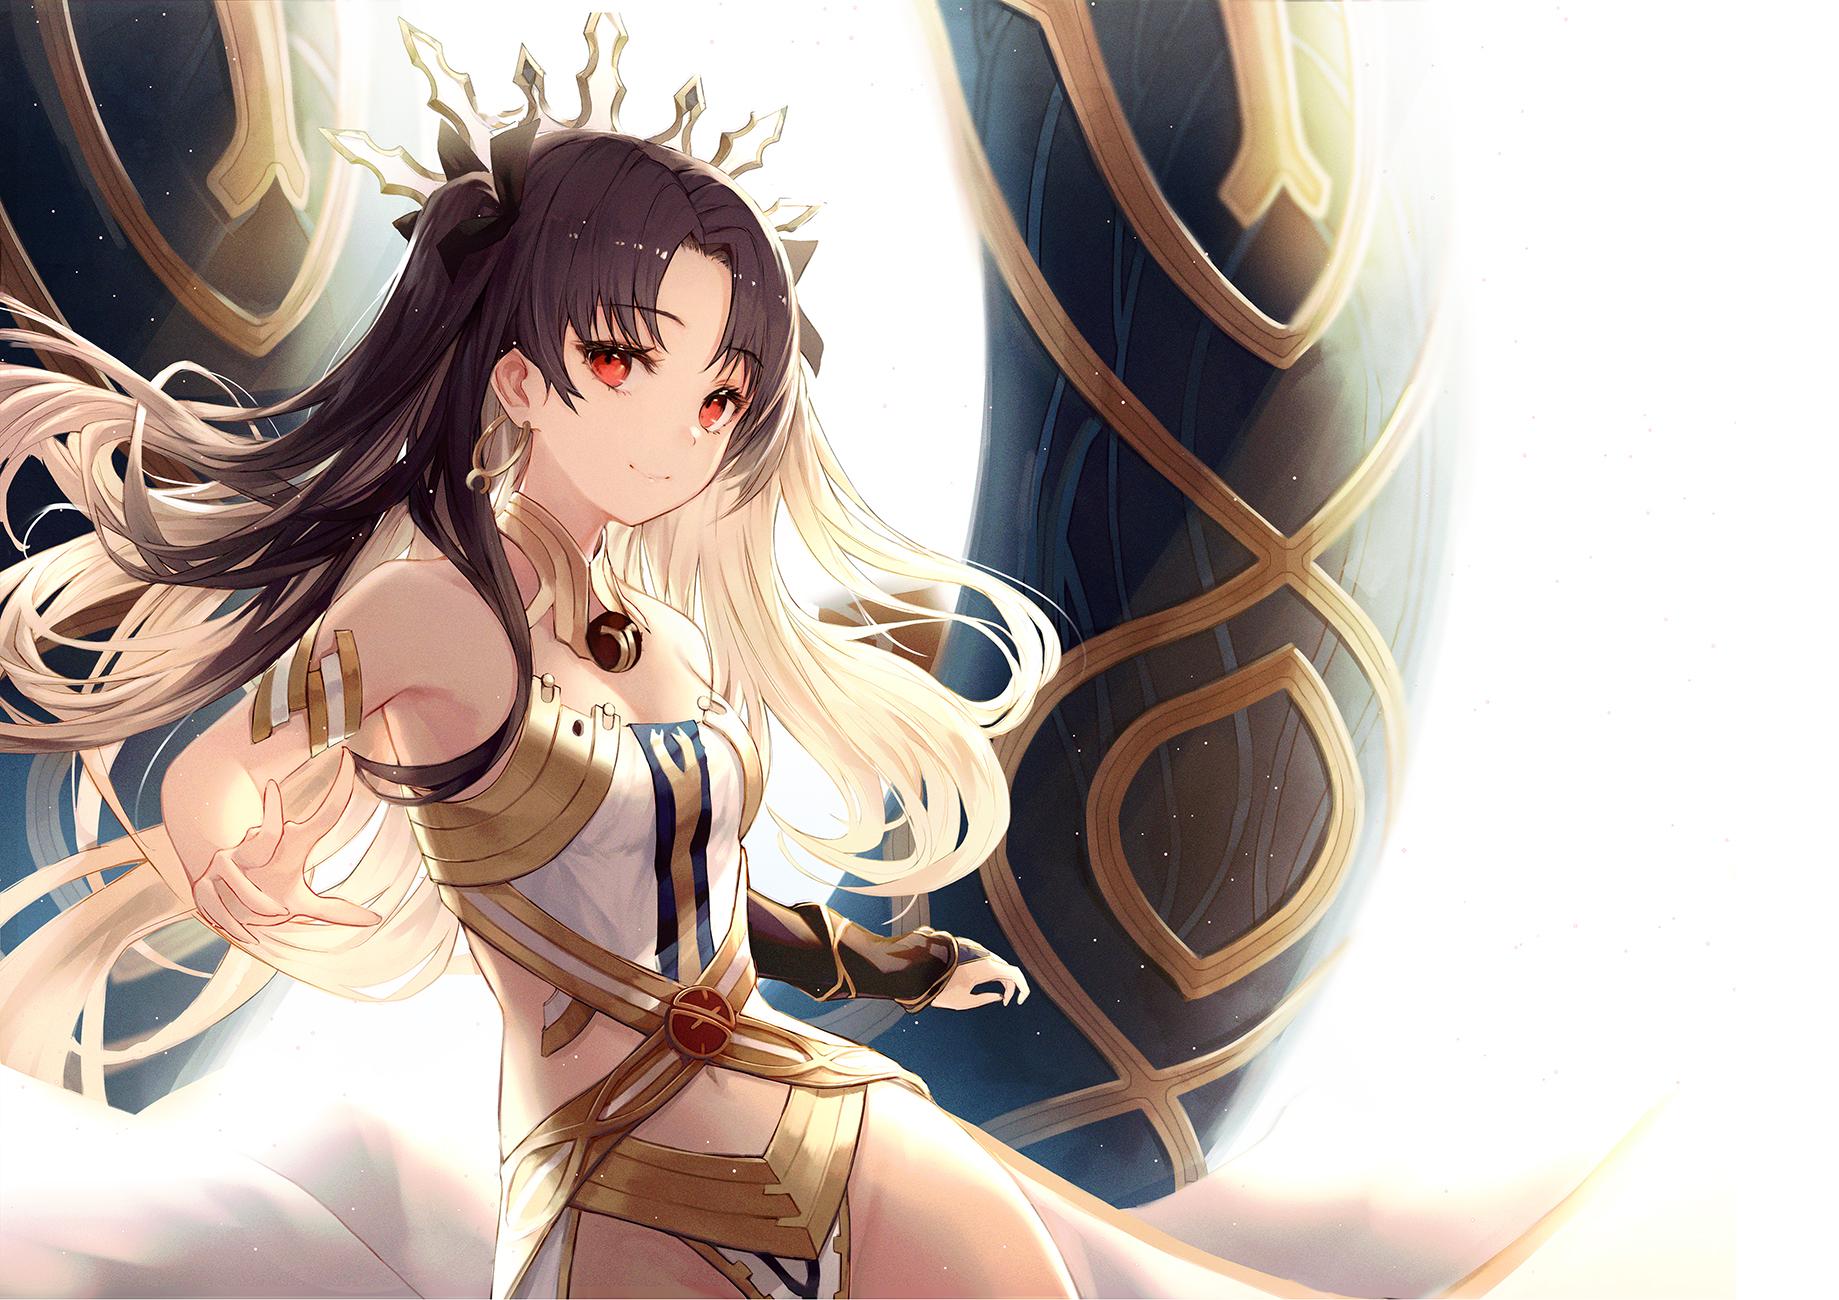 Ishtar Fate Grand Order Anime Anime Girls Portrait Digital Art Simple Background Long Hair Black Hai Wallpaper Resolution 1839x1300 Id 184272 Wallha Com